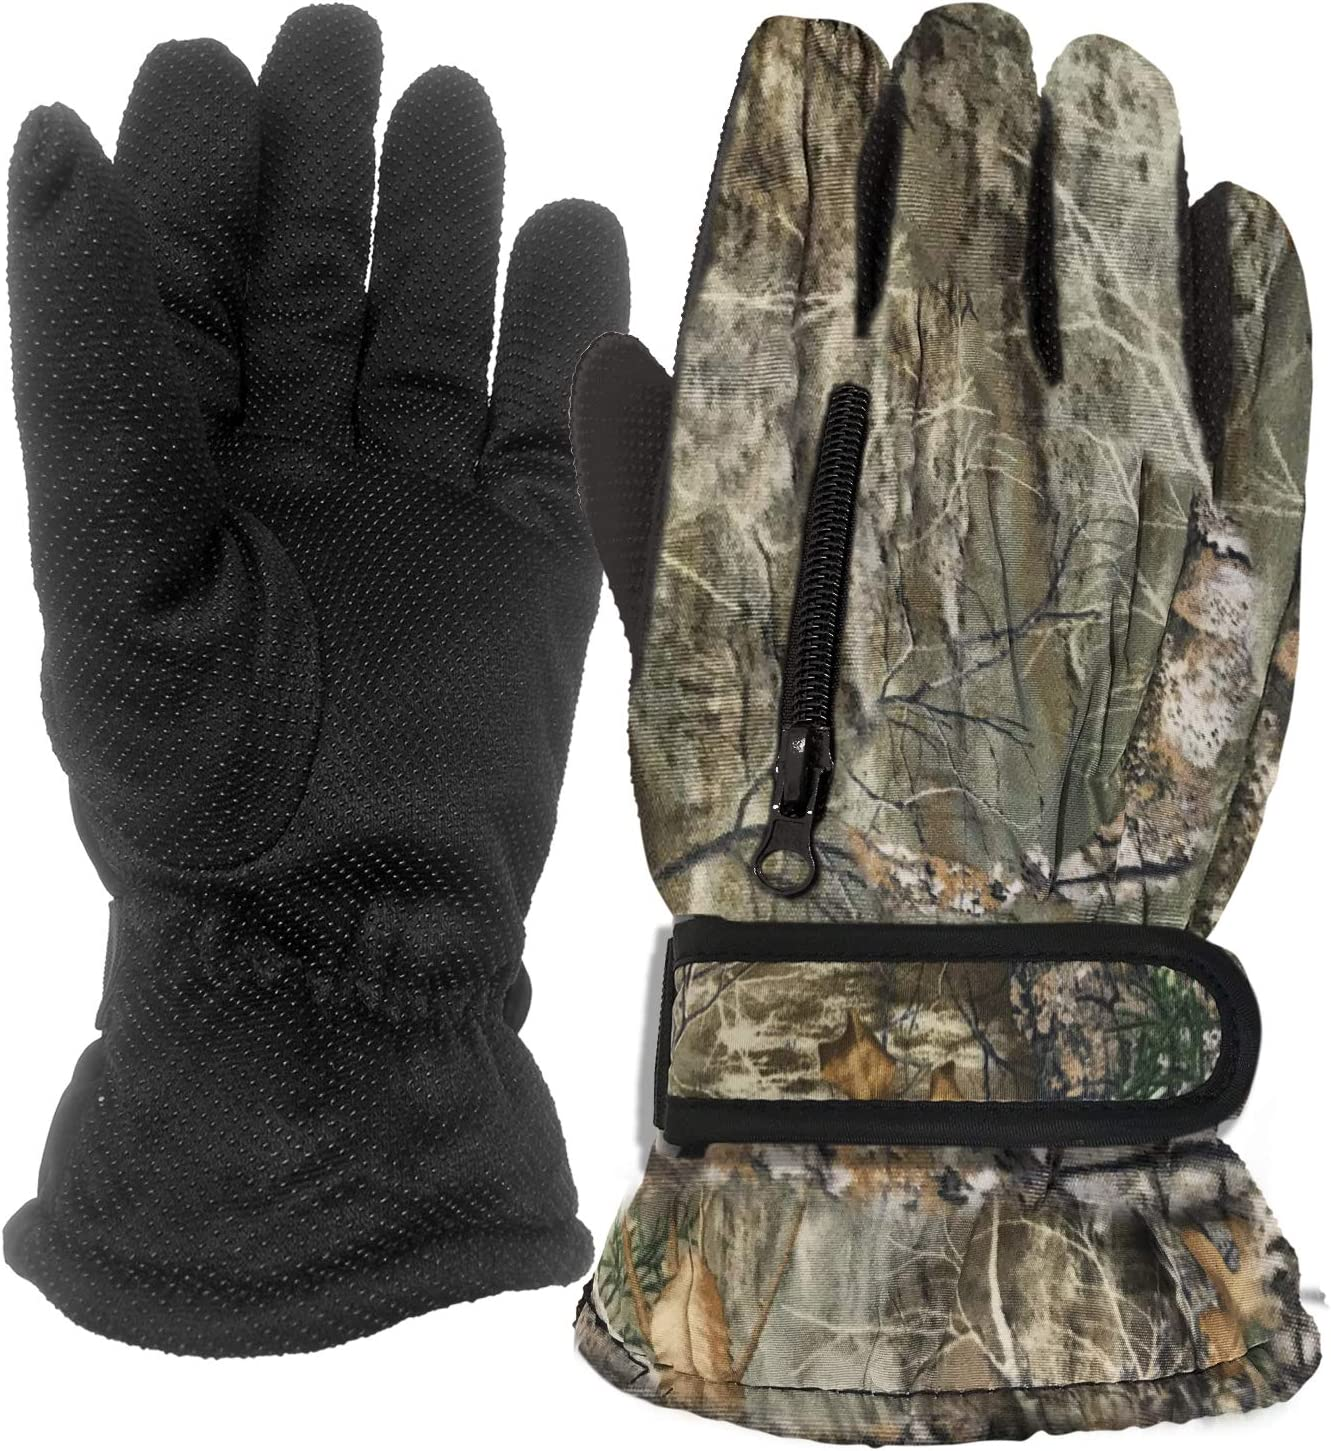 RockJock Mens Thermal Grip Gloves